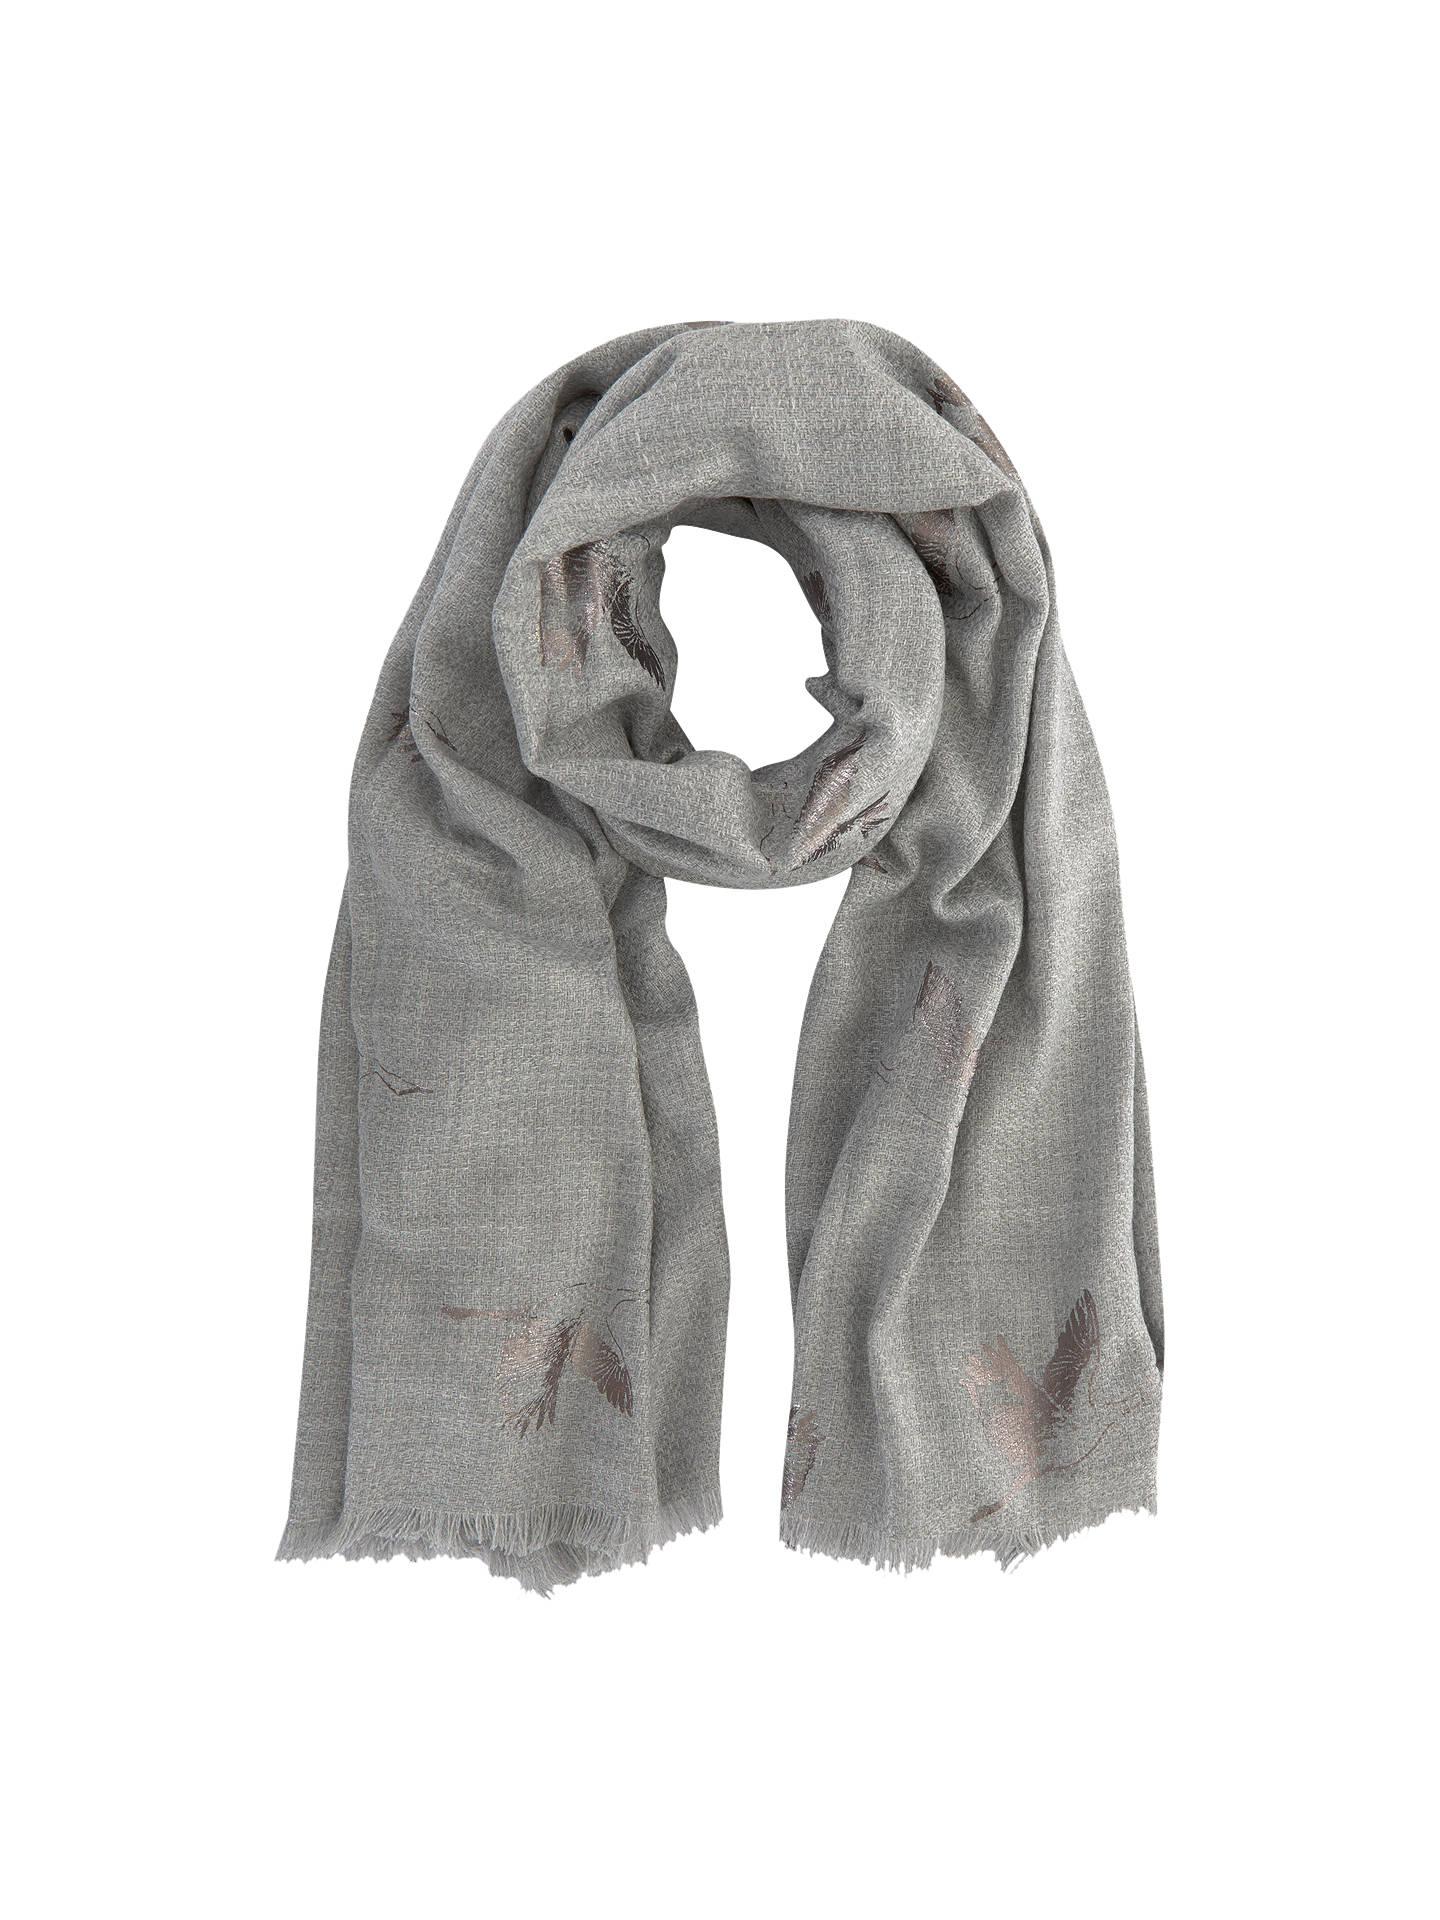 61d8a1ae9 Buy Mint Velvet Foiled Bird Blanket Scarf, Grey Online at johnlewis.com ...